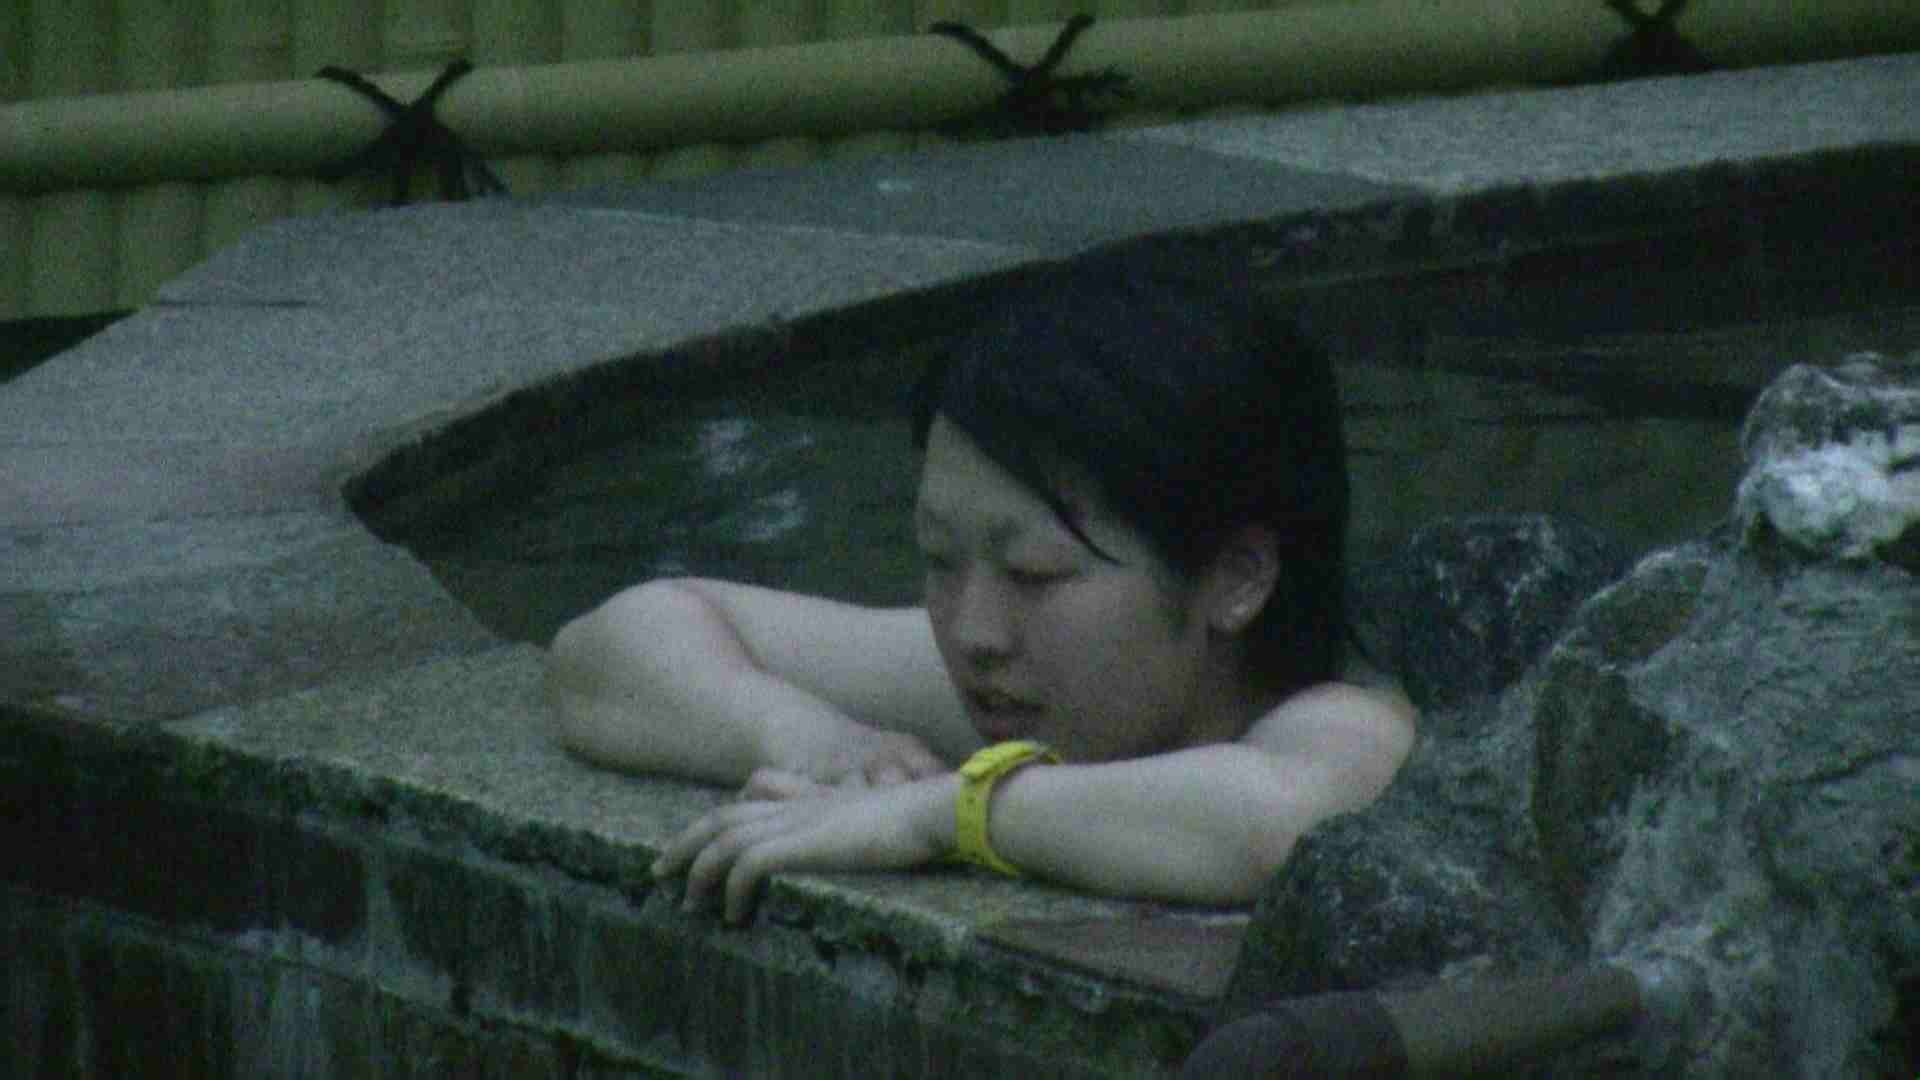 Aquaな露天風呂Vol.05【VIP】 露天風呂編 | 盗撮シリーズ  112PIX 91